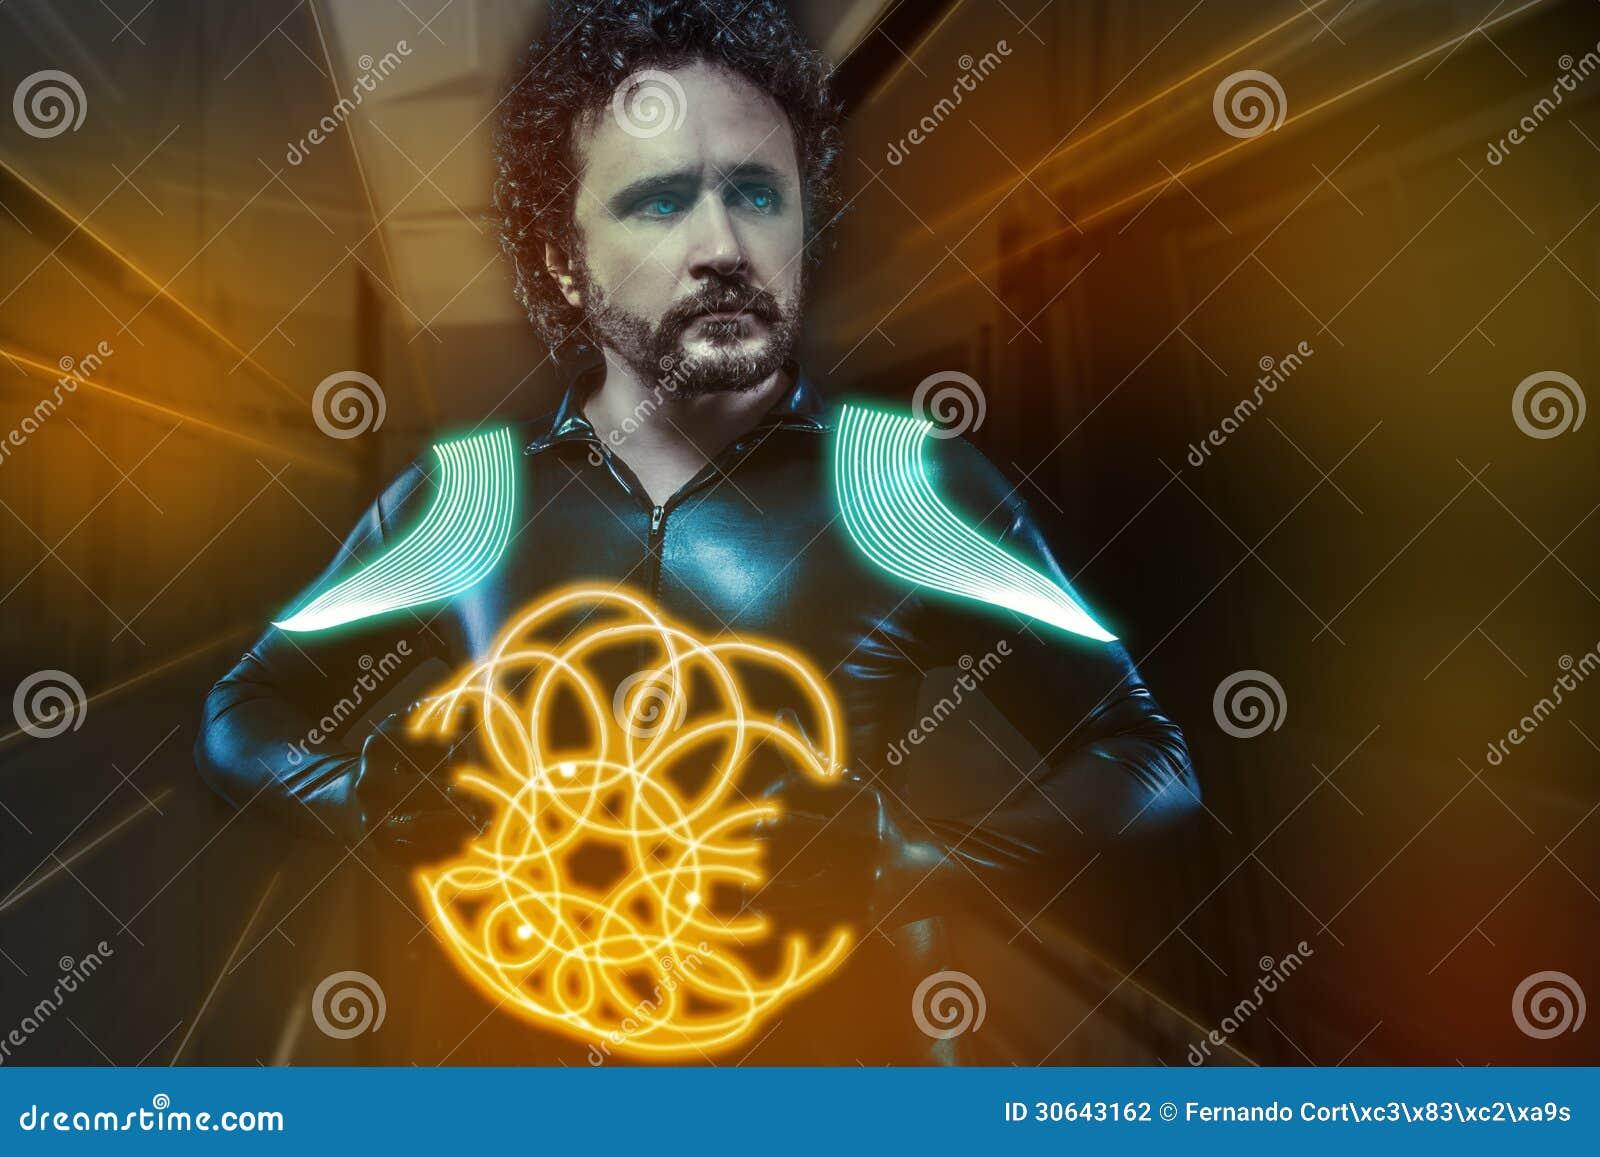 Future soldier, warrior latex suit and futuristic weapon, orange